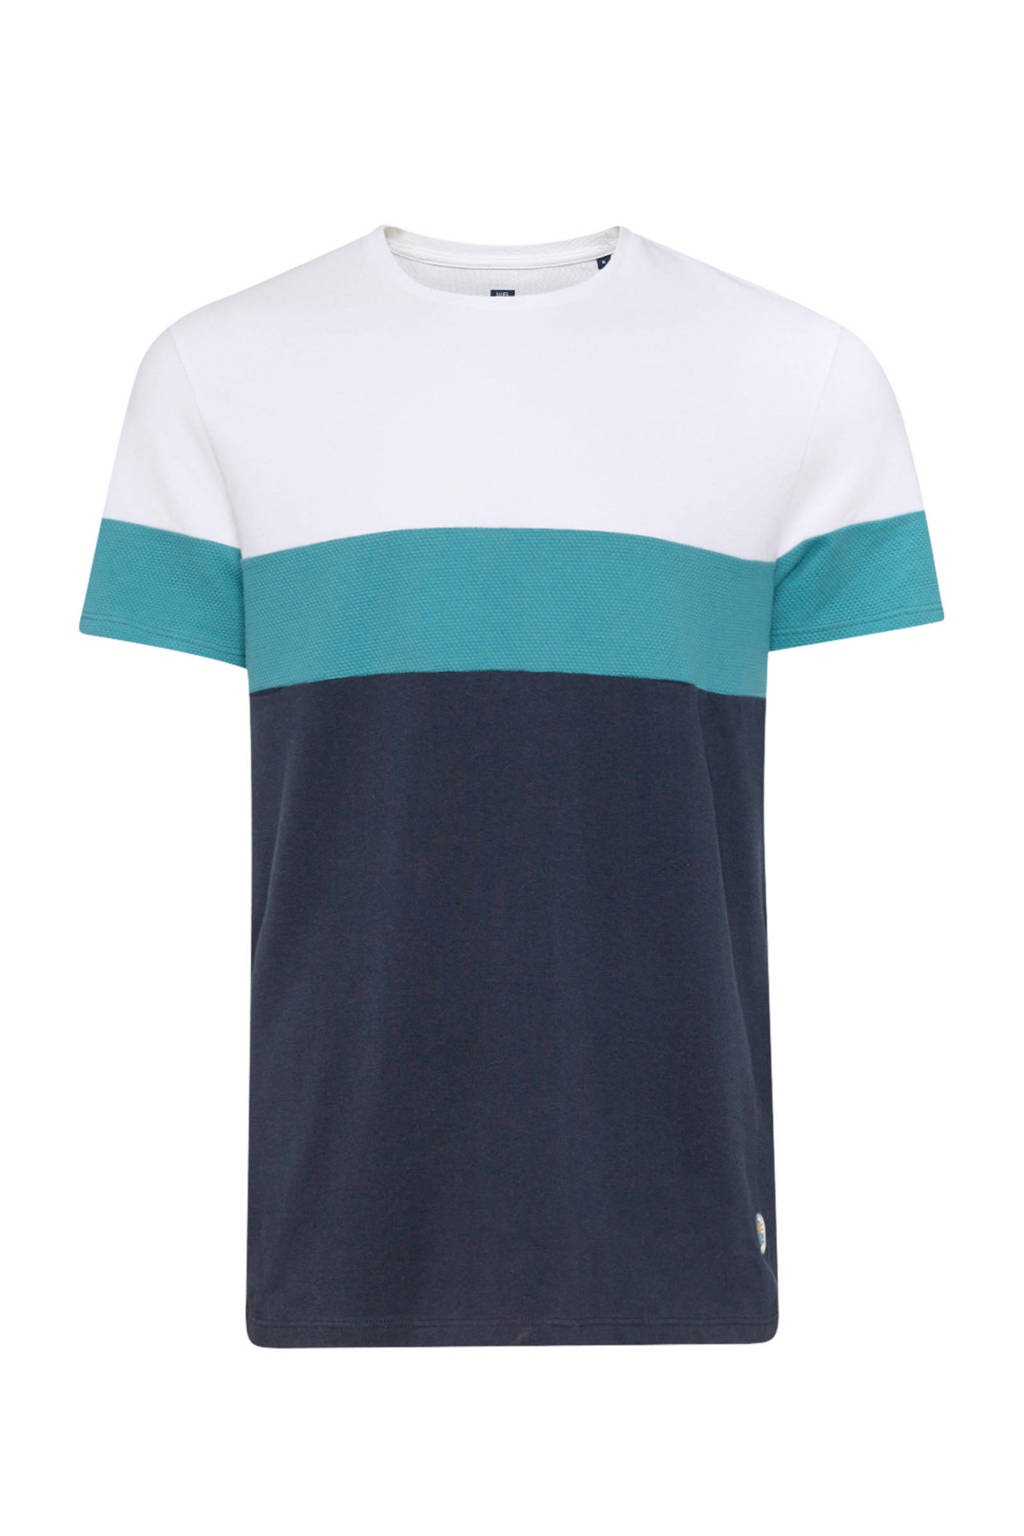 WE Fashion regular fit T-shirt, Donkerblauw